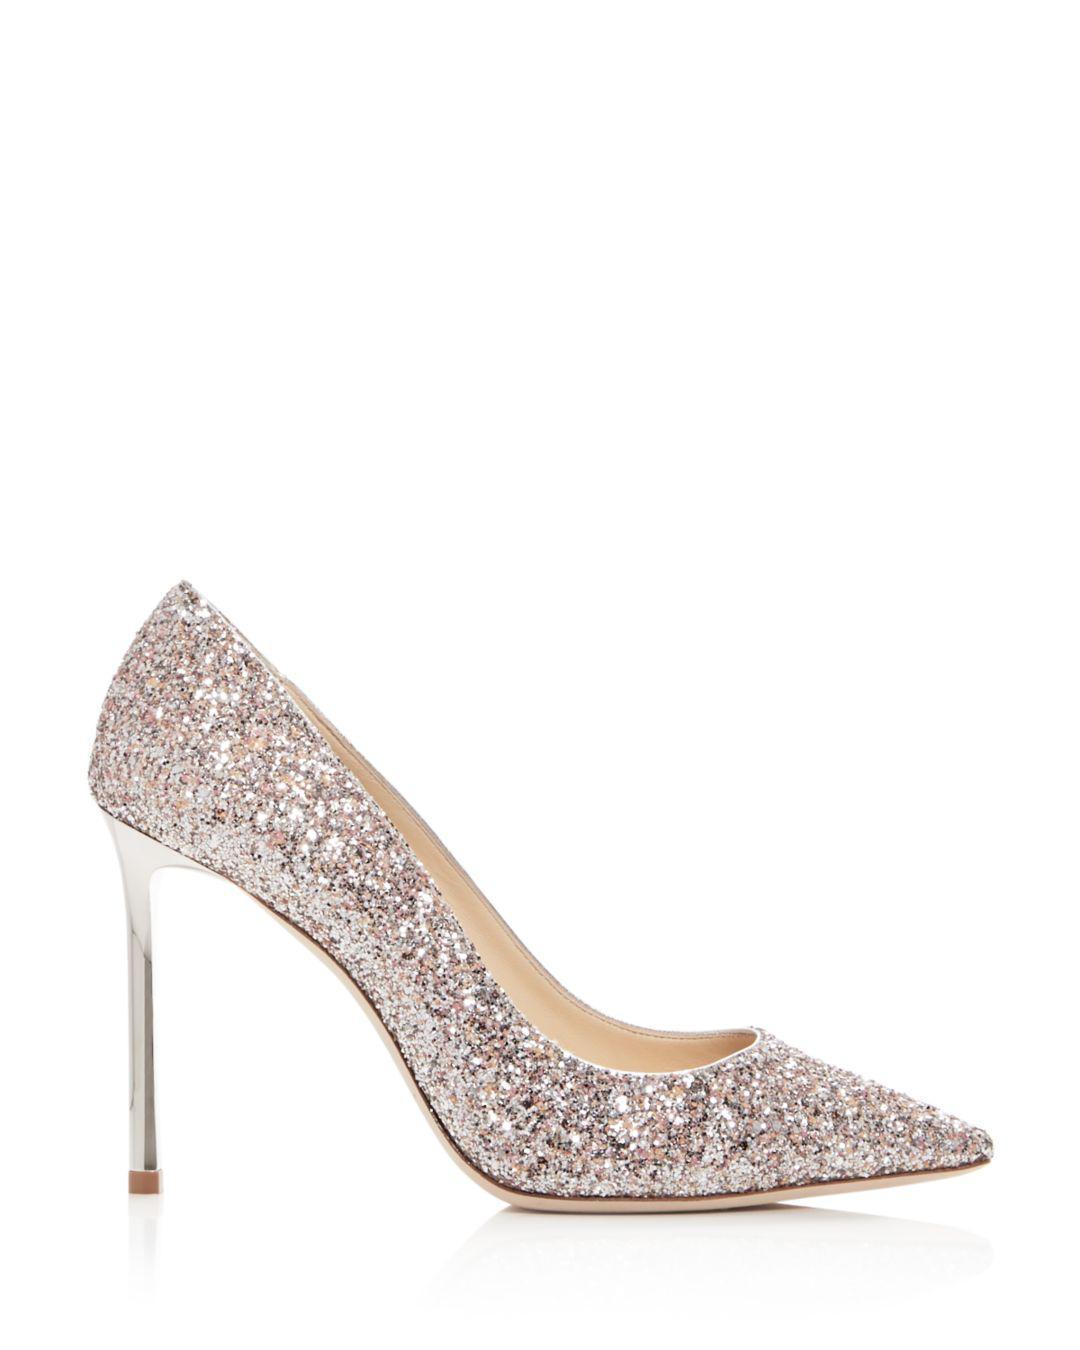 e1849d0c5cfe Lyst - Jimmy Choo Women s Romy 100 Glitter Pointed-toe Pumps